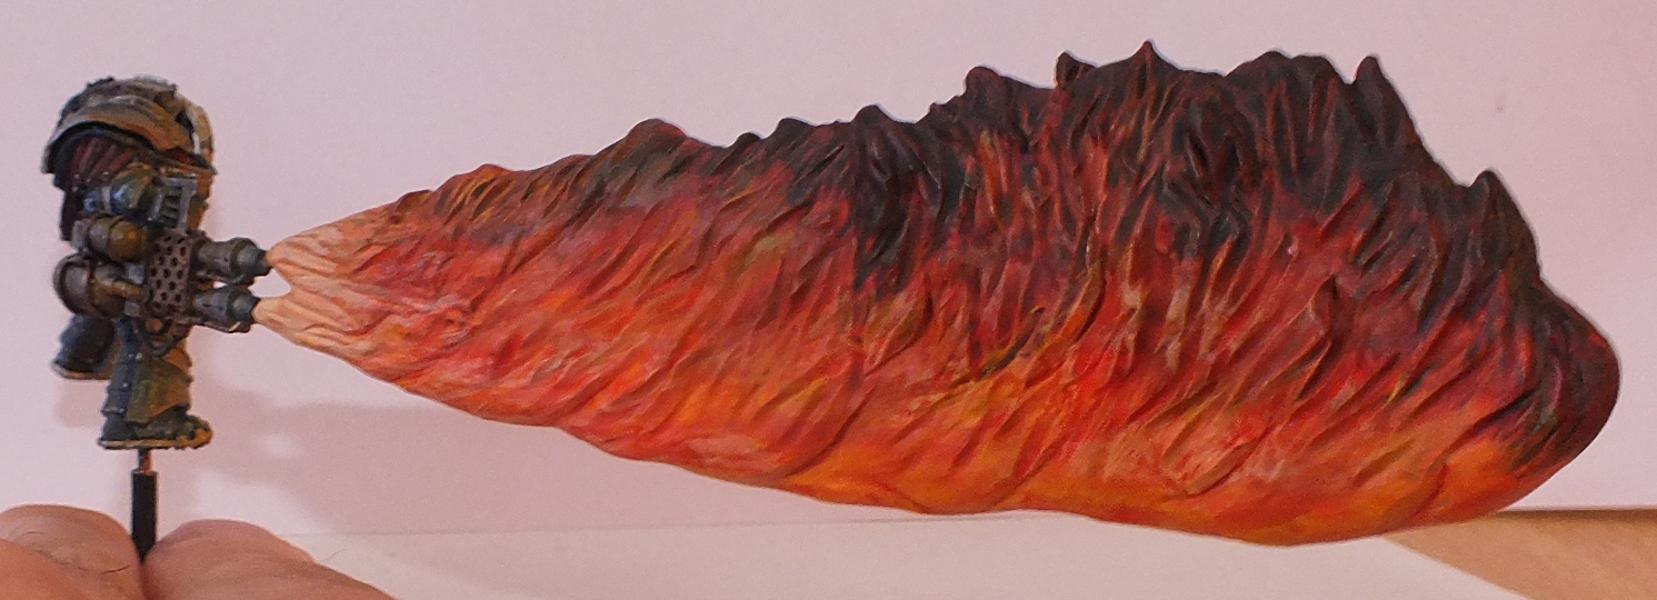 1ère figurines pour diorama Istvaan V - Page 3 371010DSCF5039